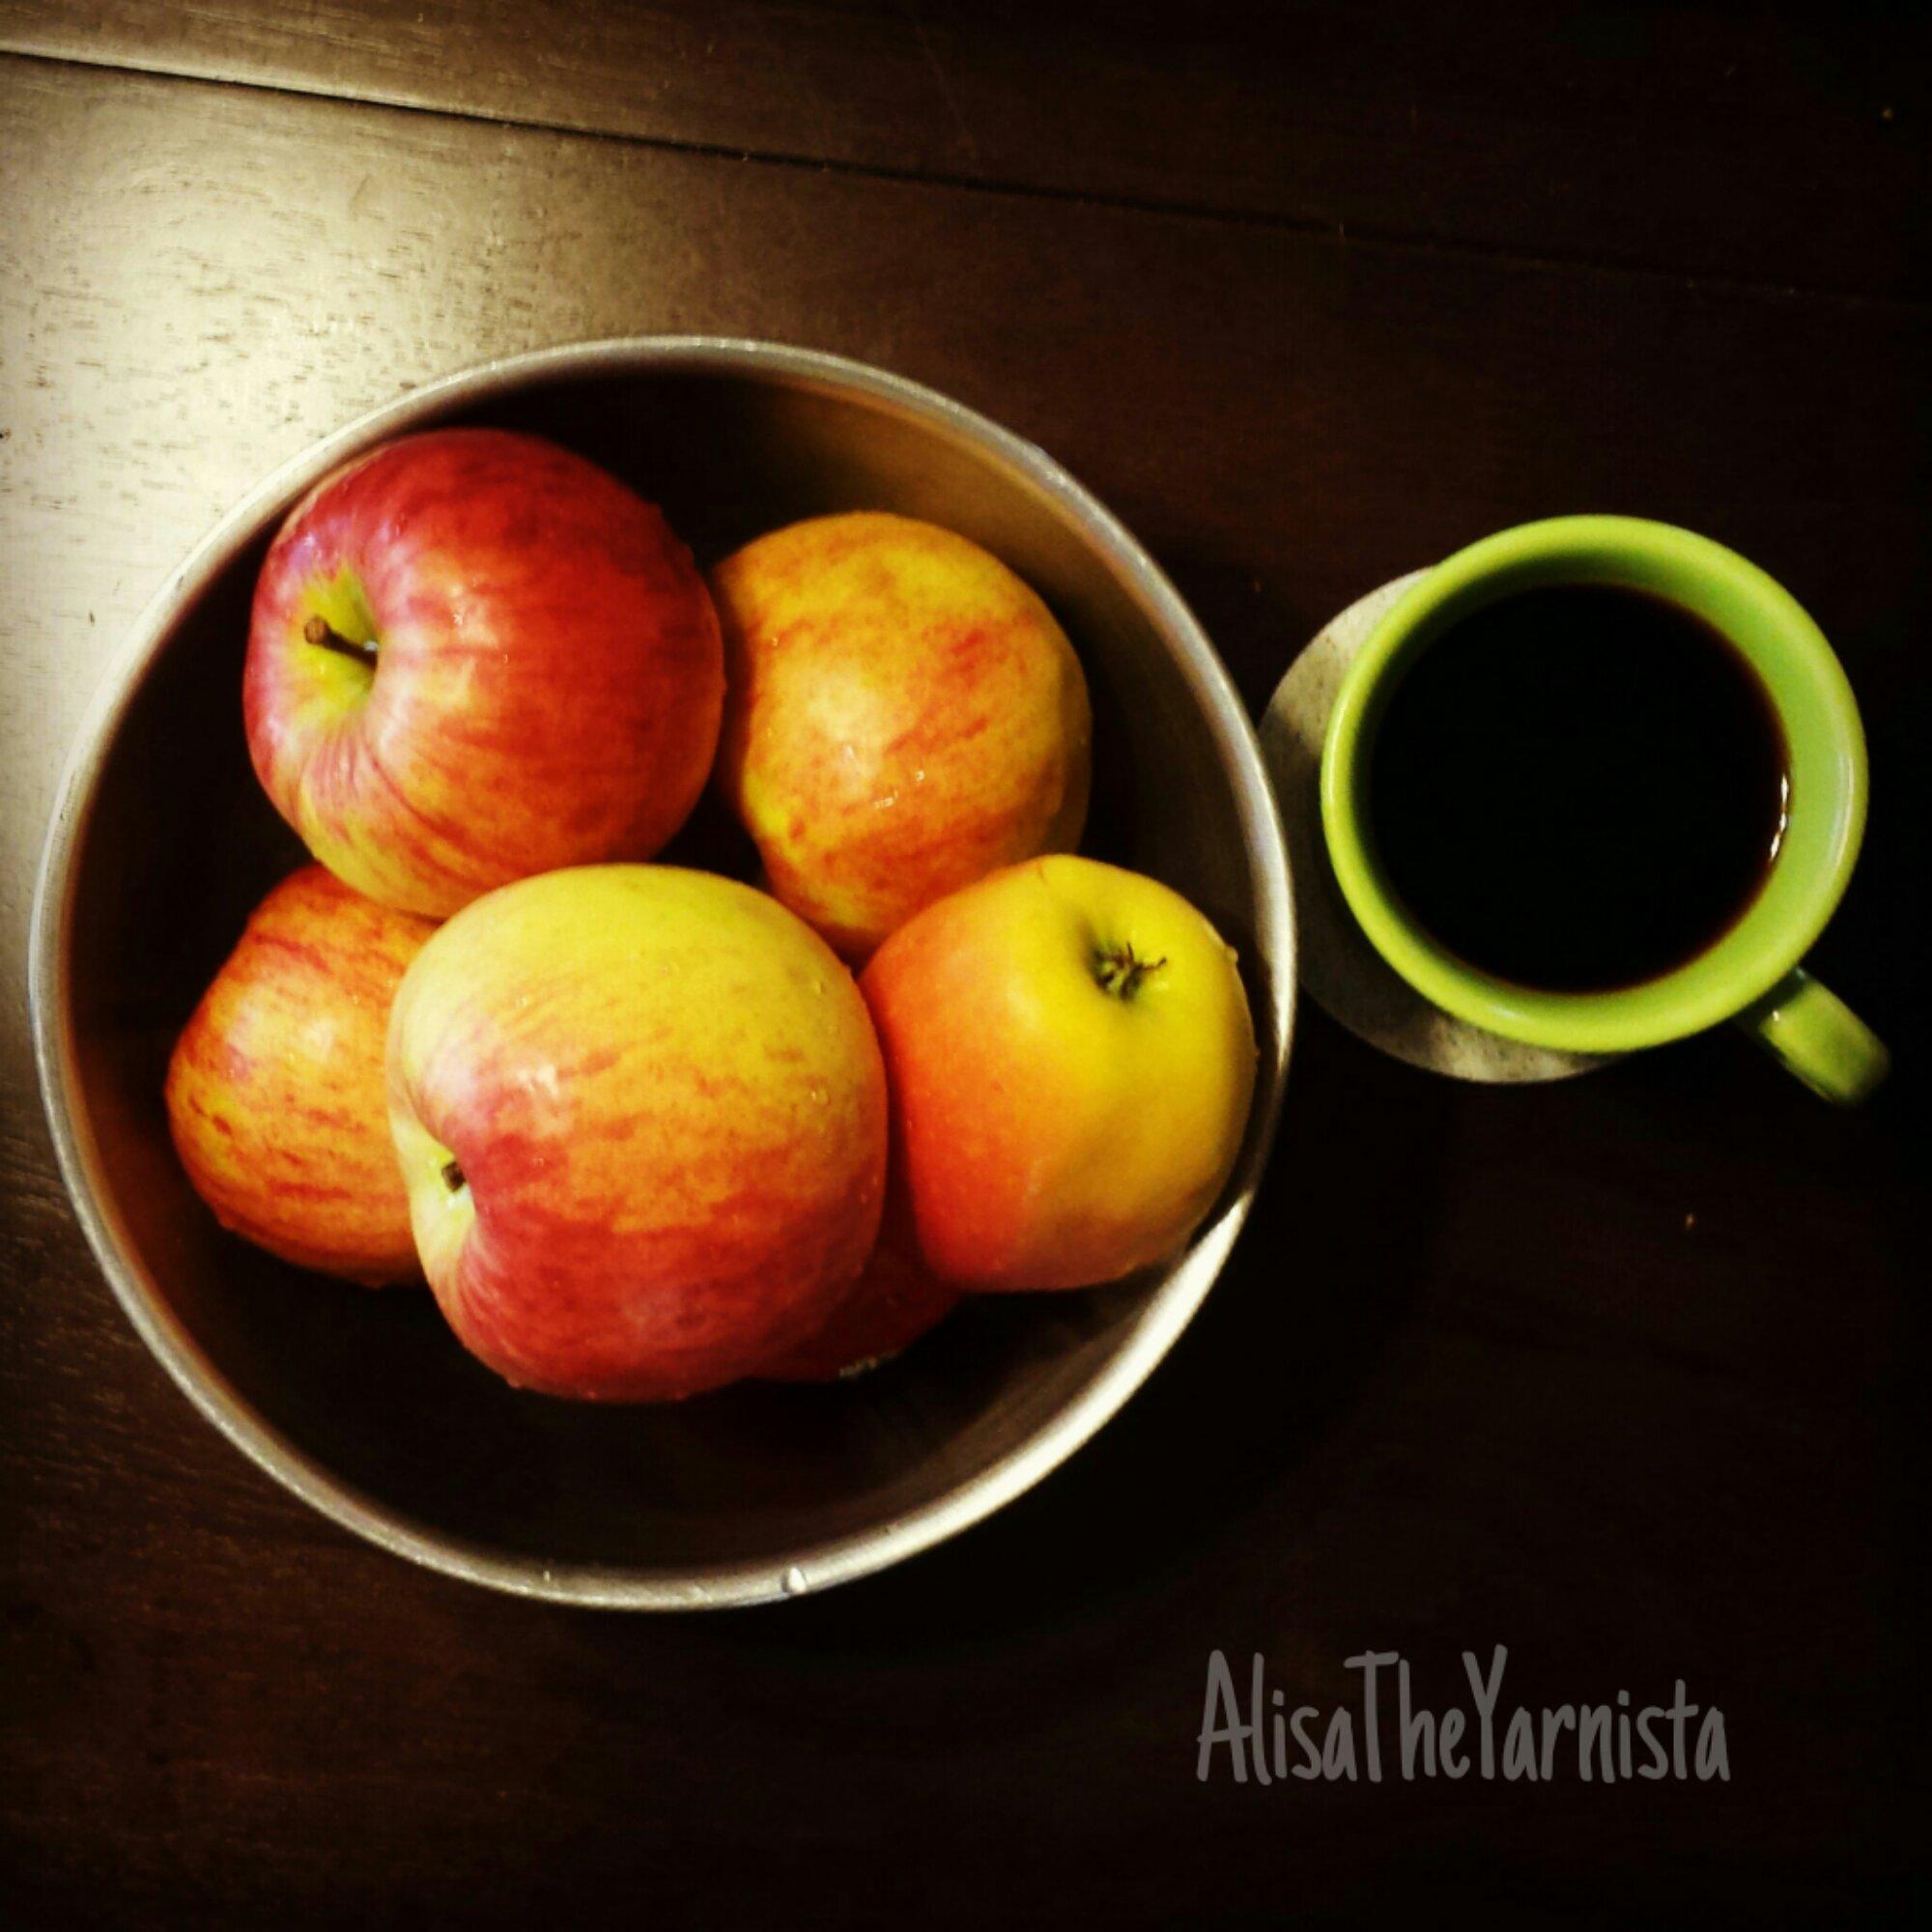 wpid-applesauce.jpg